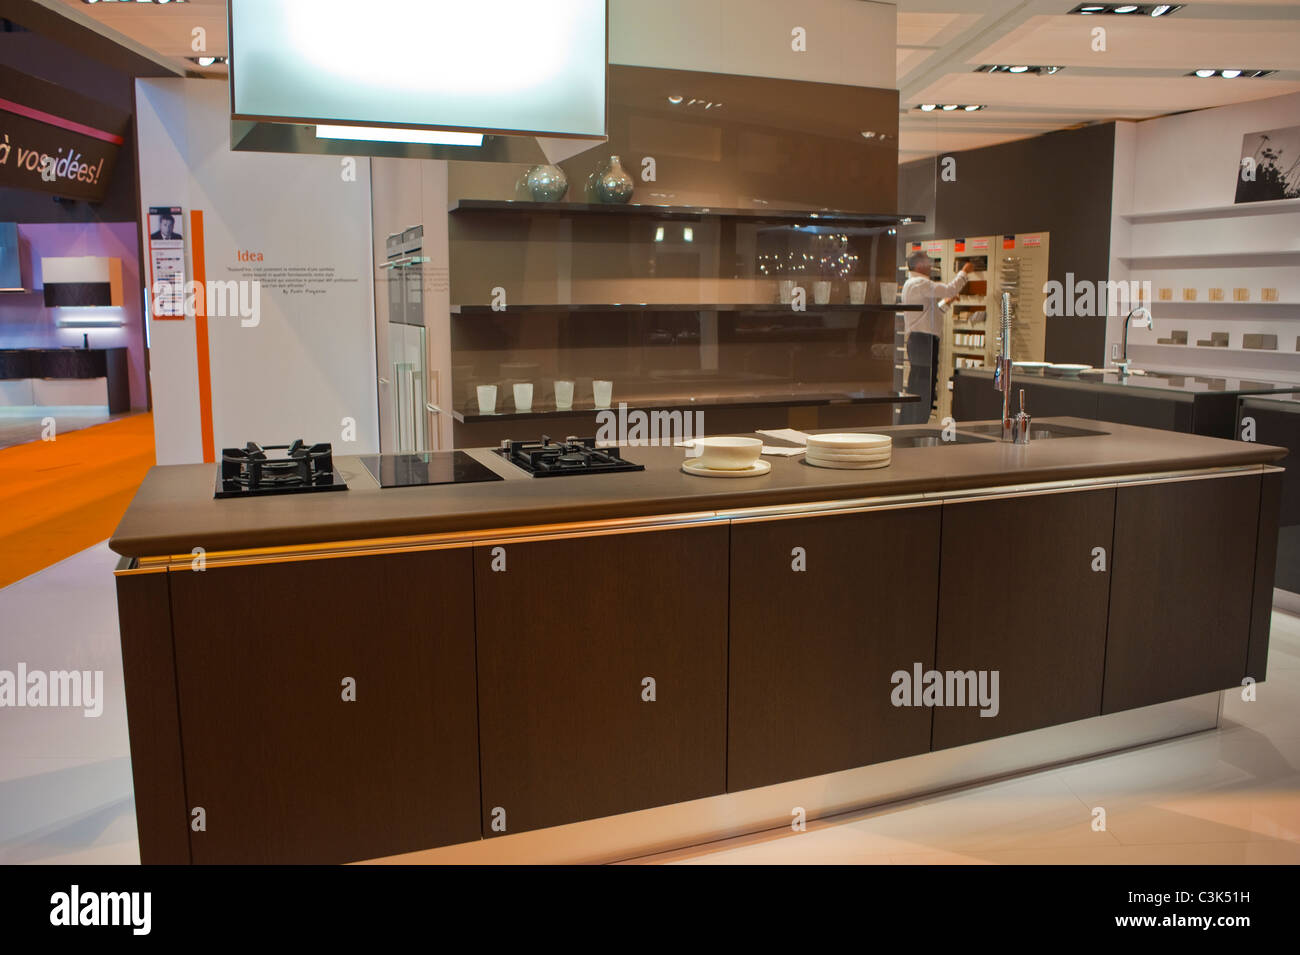 paris france italian design kitchen at industrial trade show